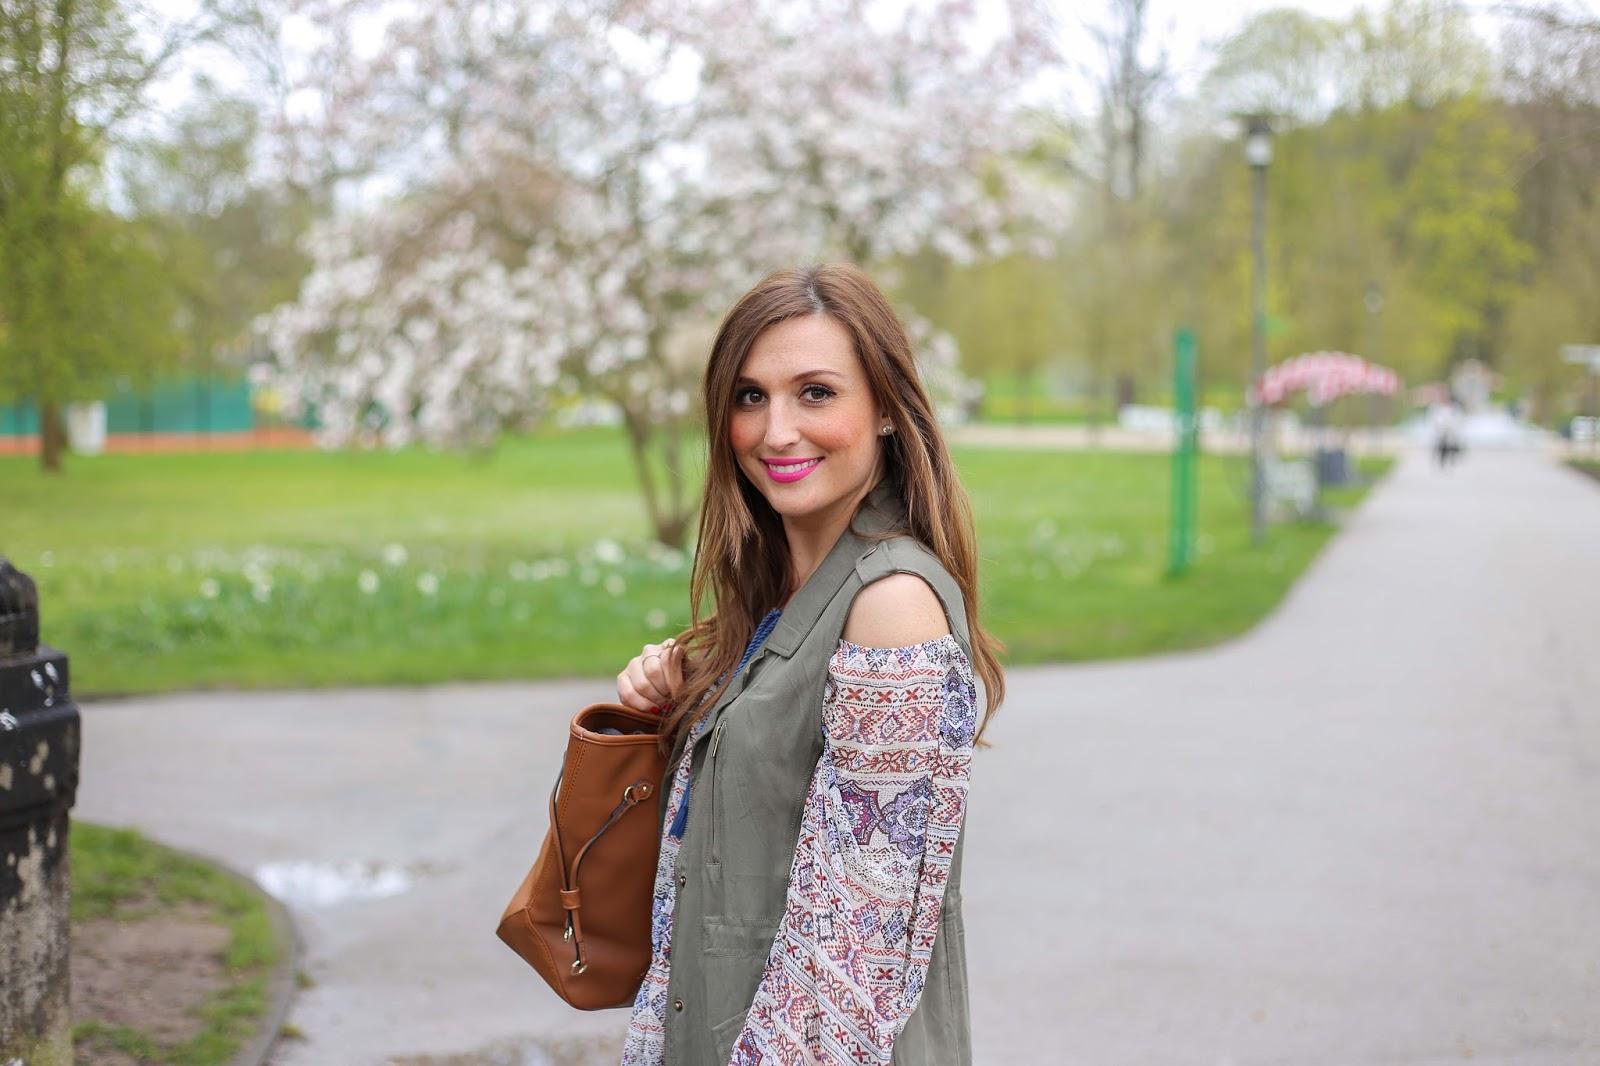 Frankfurt Fashionblogger